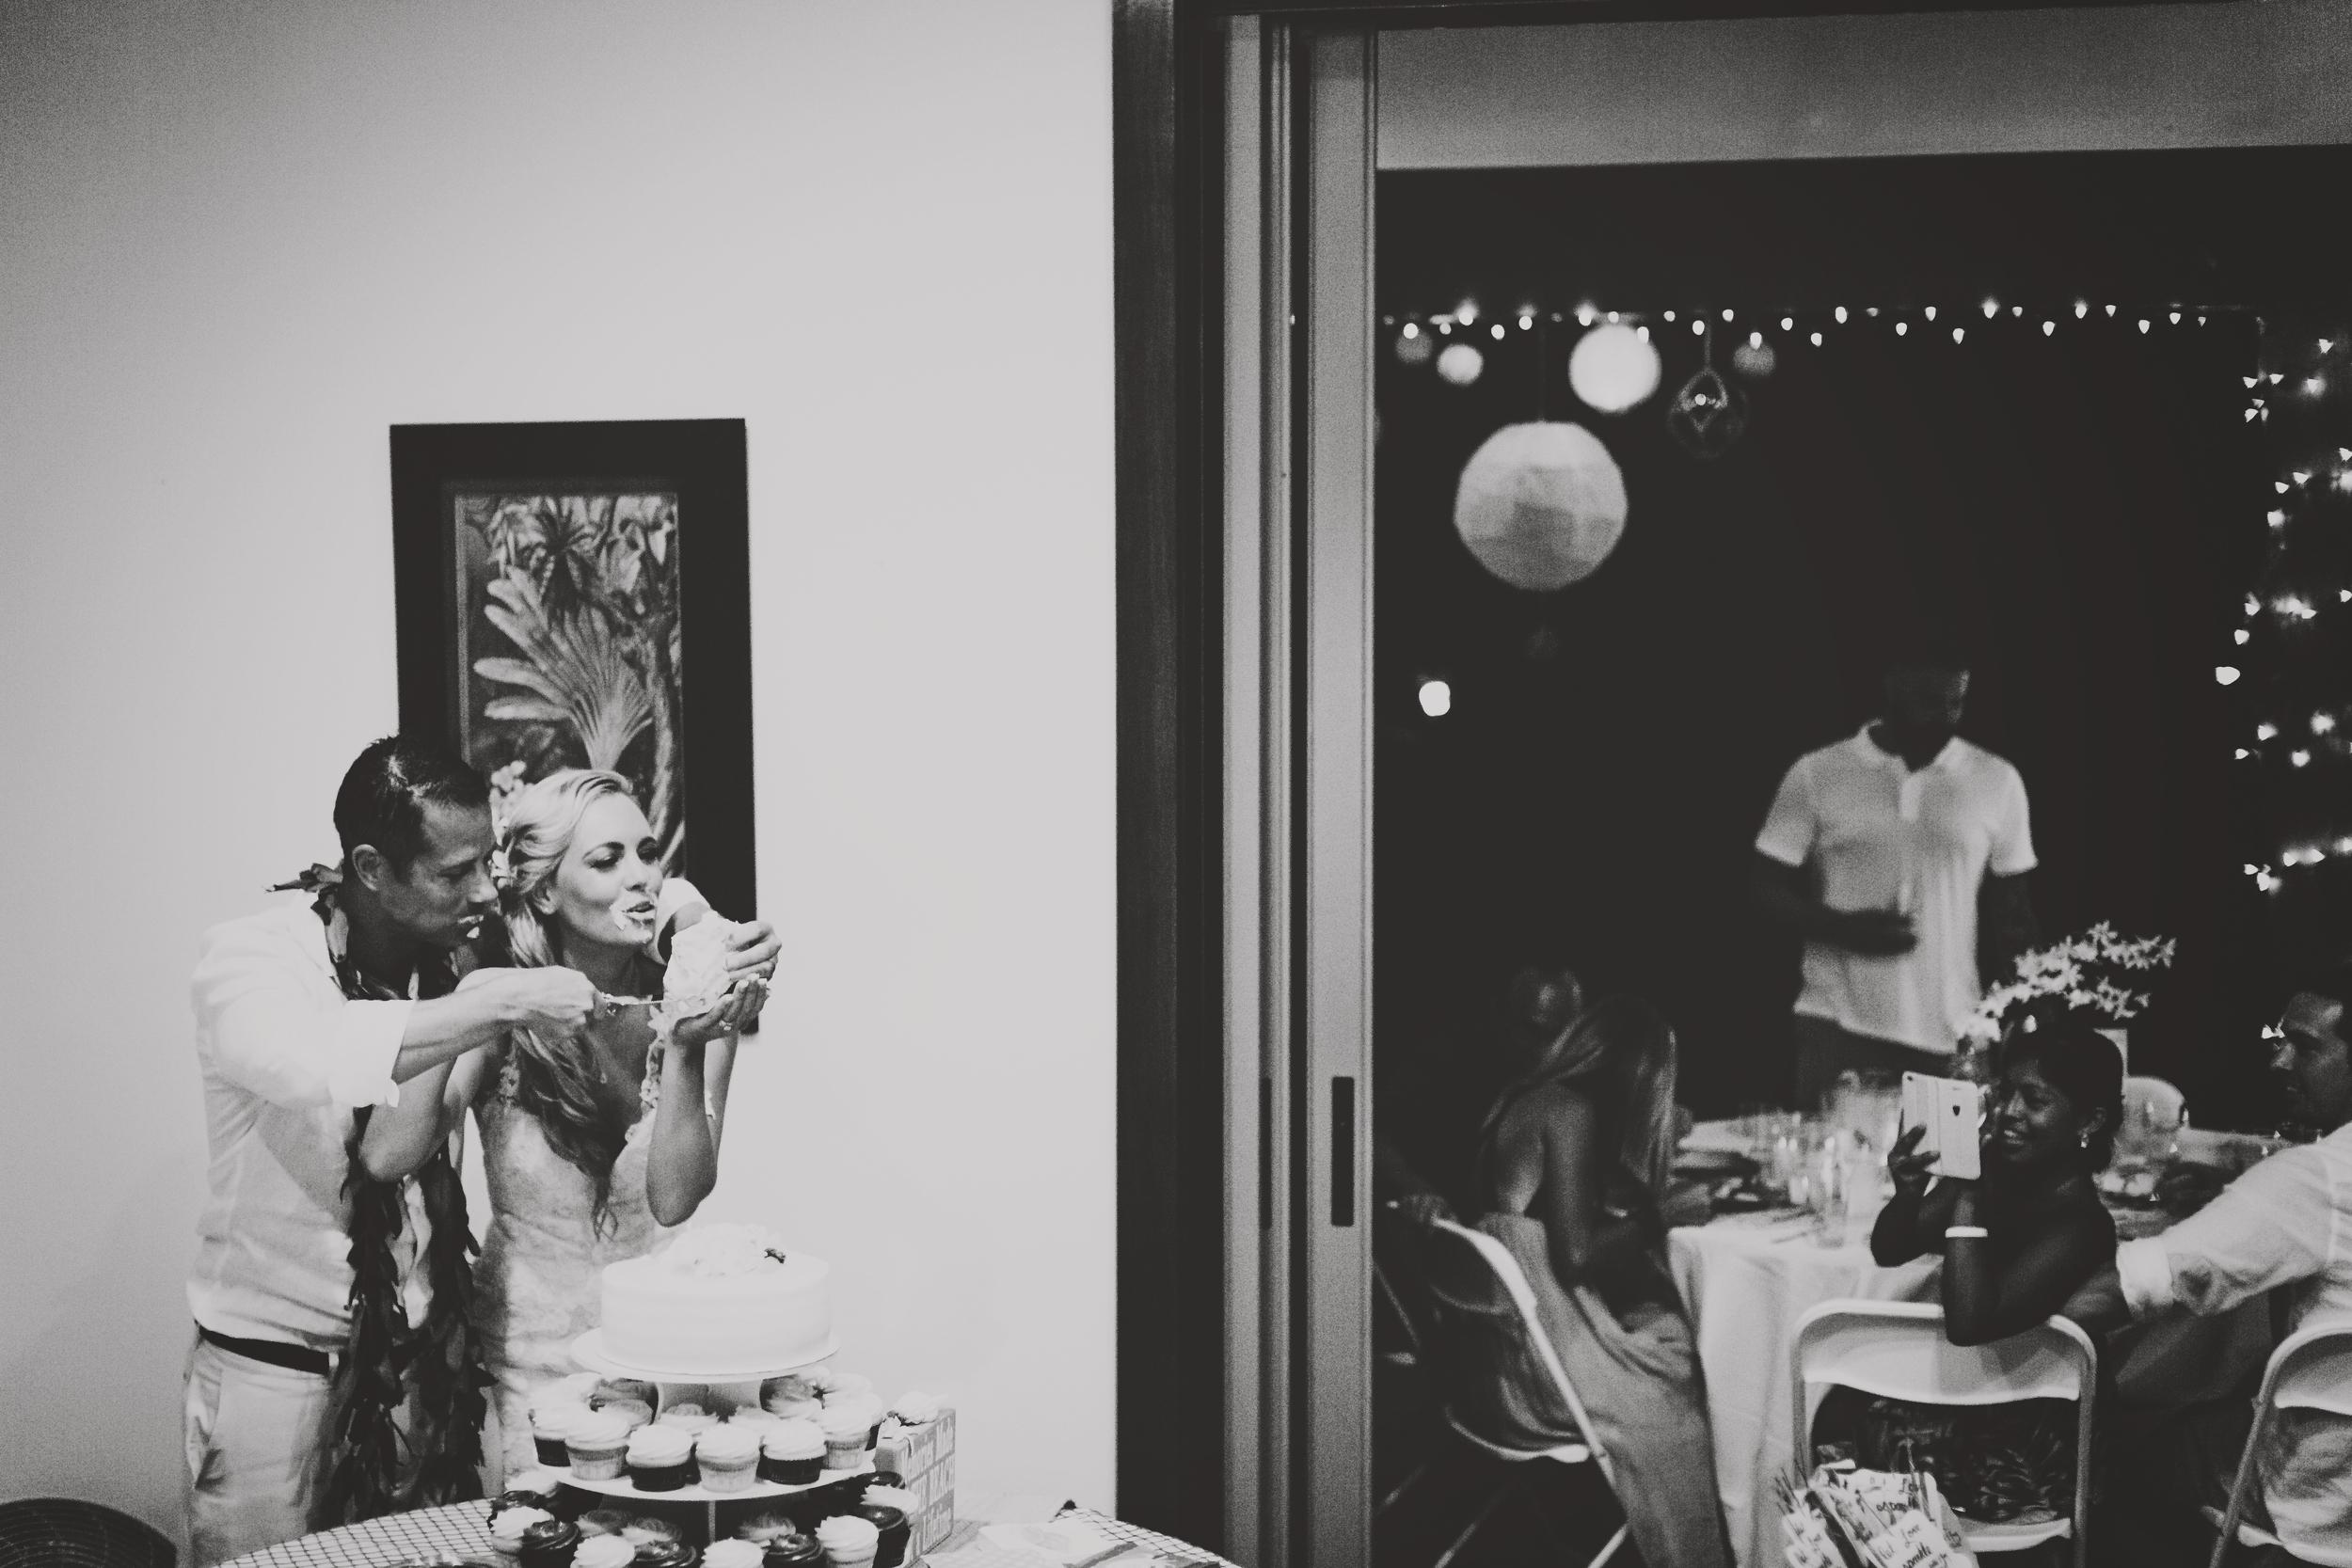 angie-diaz-photography-hawaii-wedding-photographer-kelli-jay-131.jpg